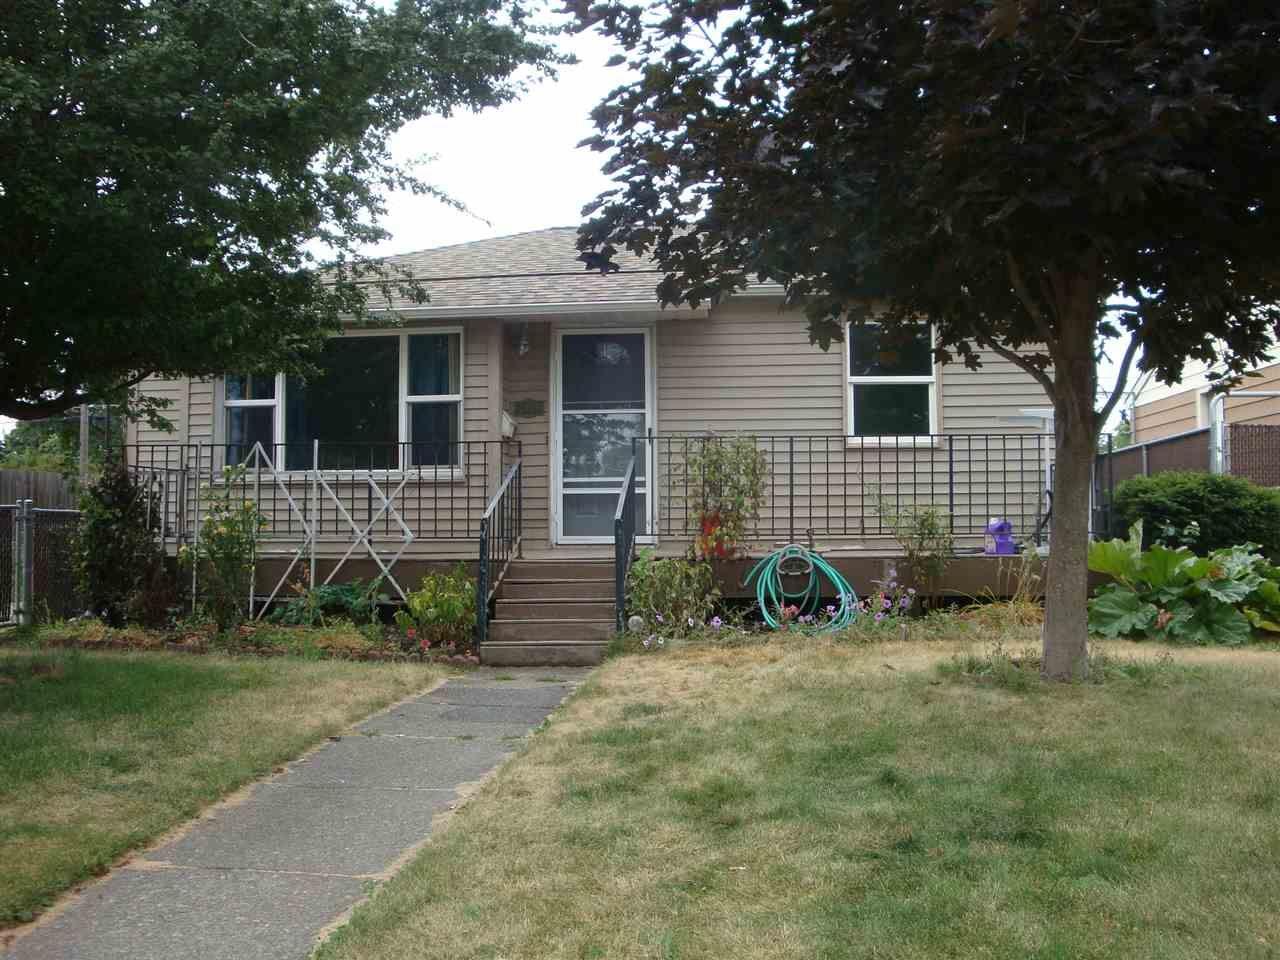 2414 E Hoffman Ave, Spokane, WA 99207 - #: 202020401